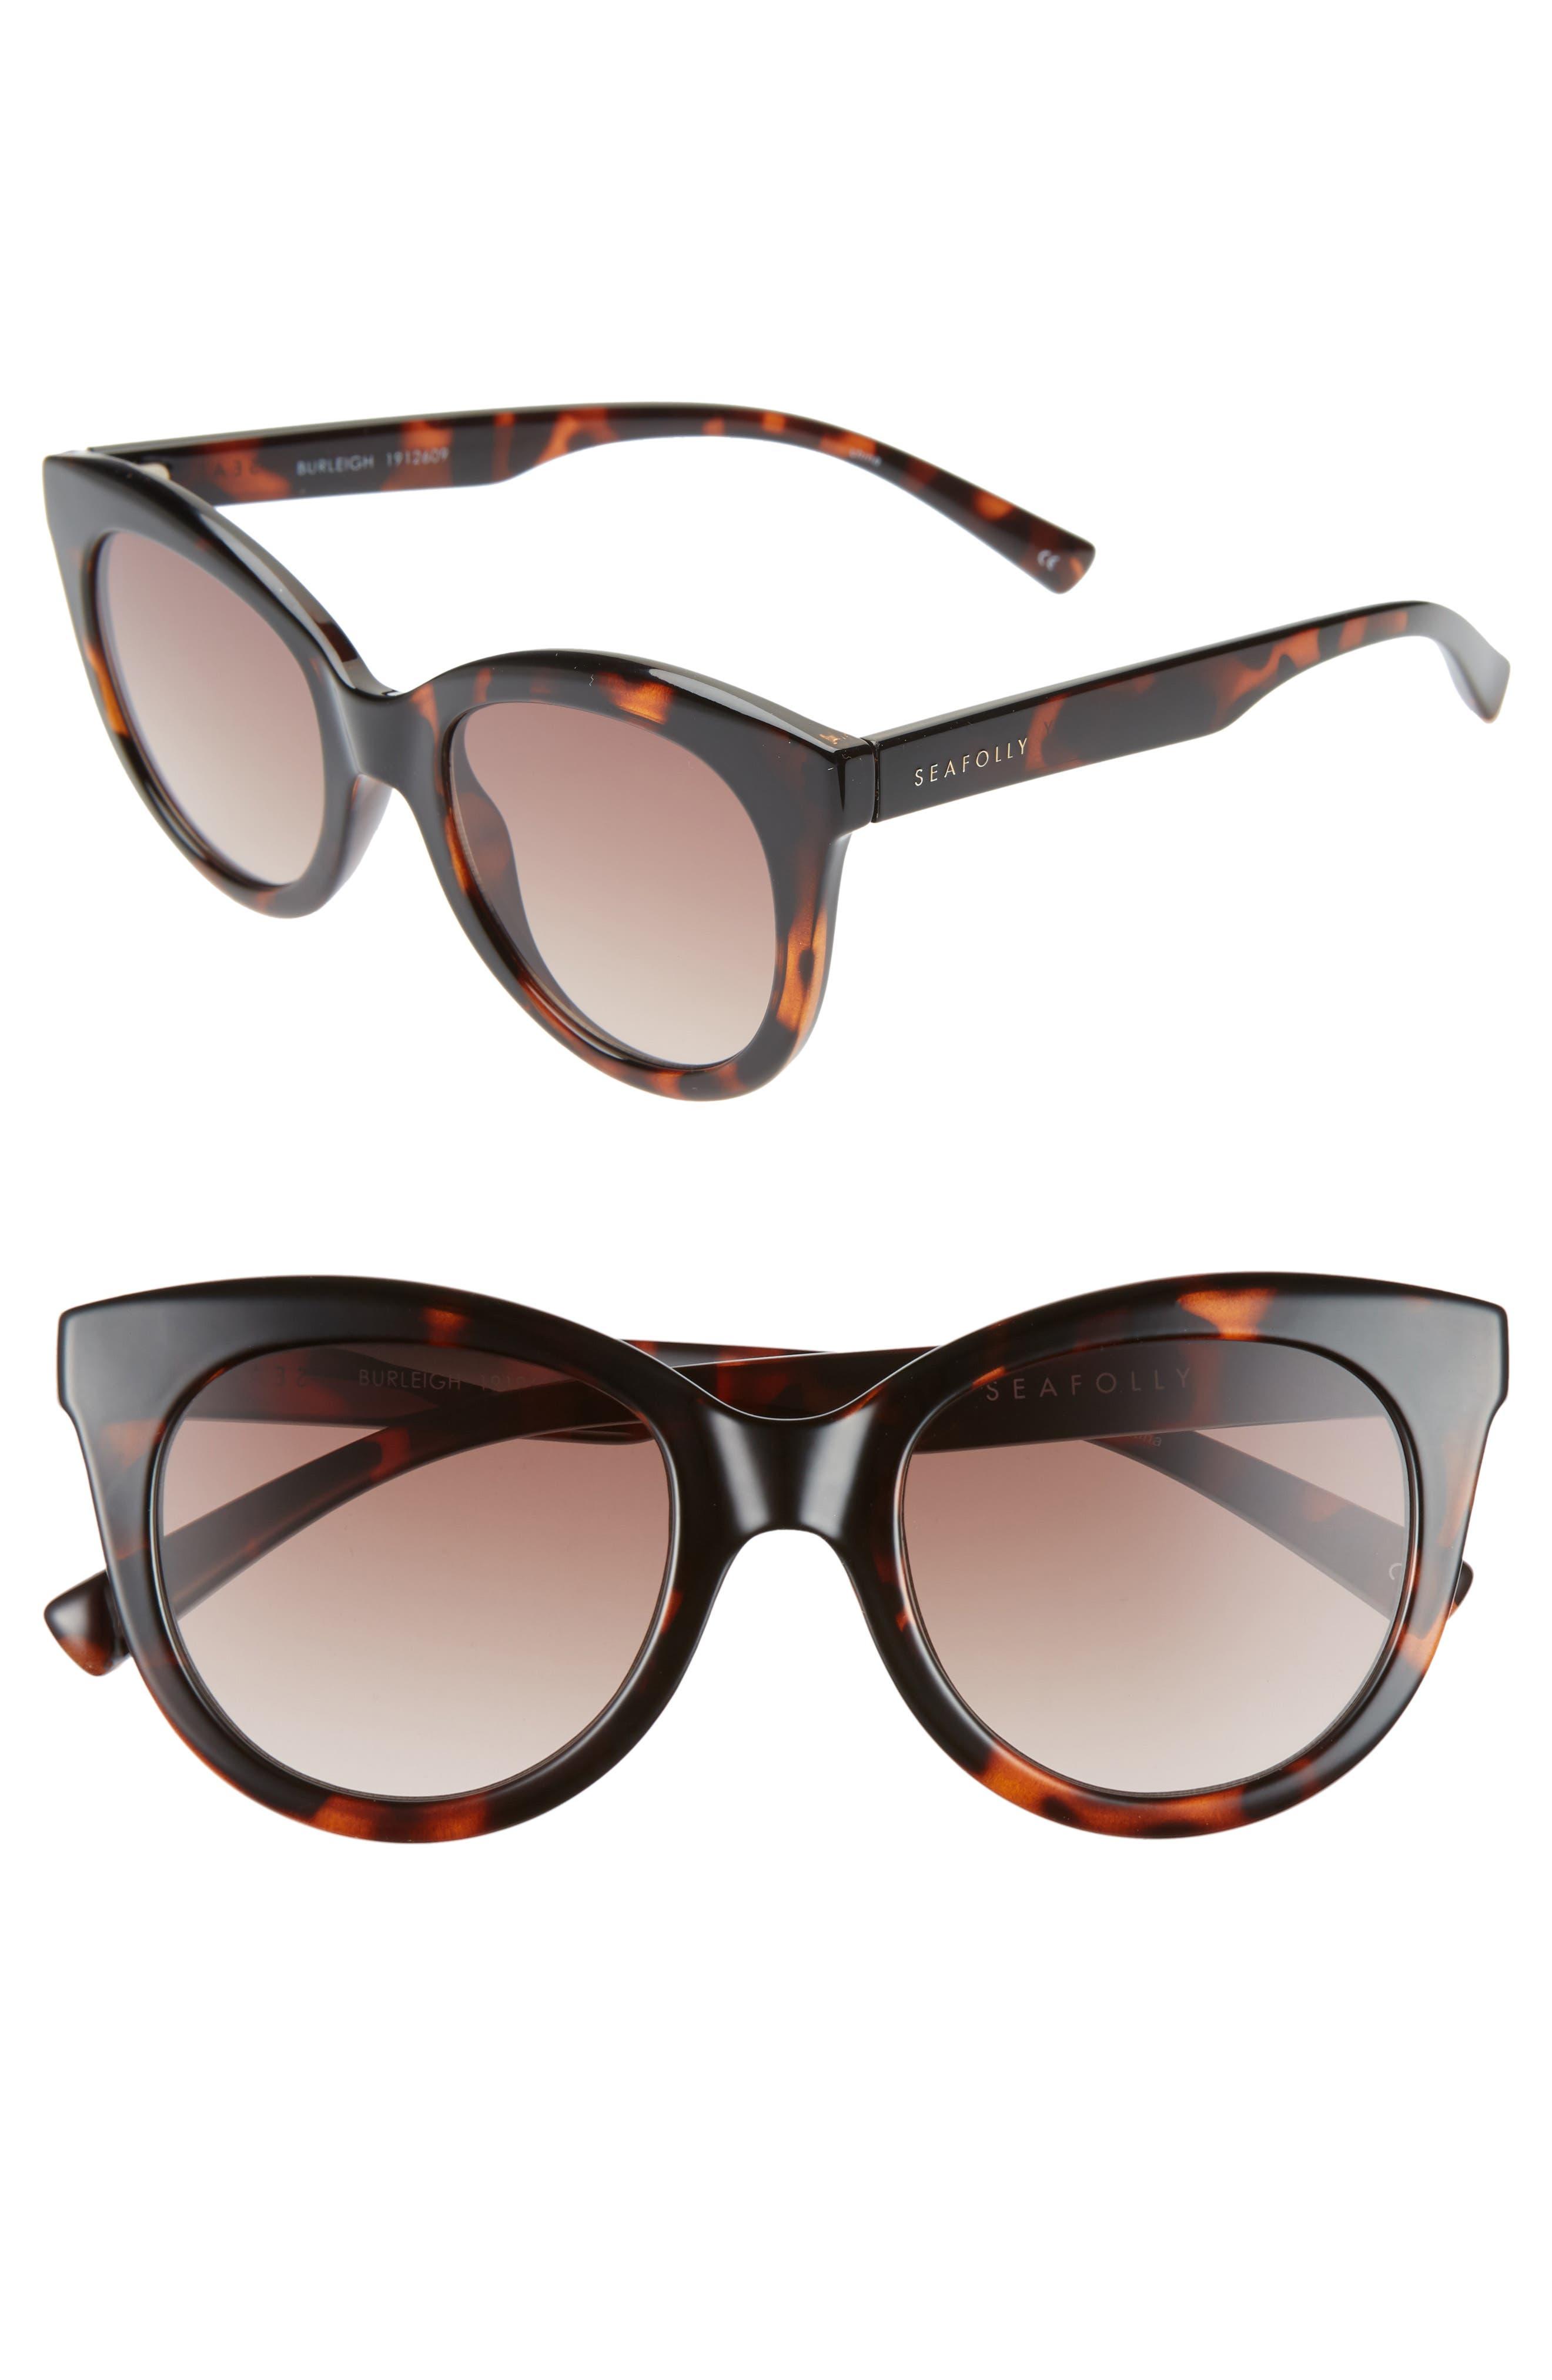 Seafolly Burleigh 50Mm Cat Eye Sunglasses - Dark Tortoise/ Brown Gradient